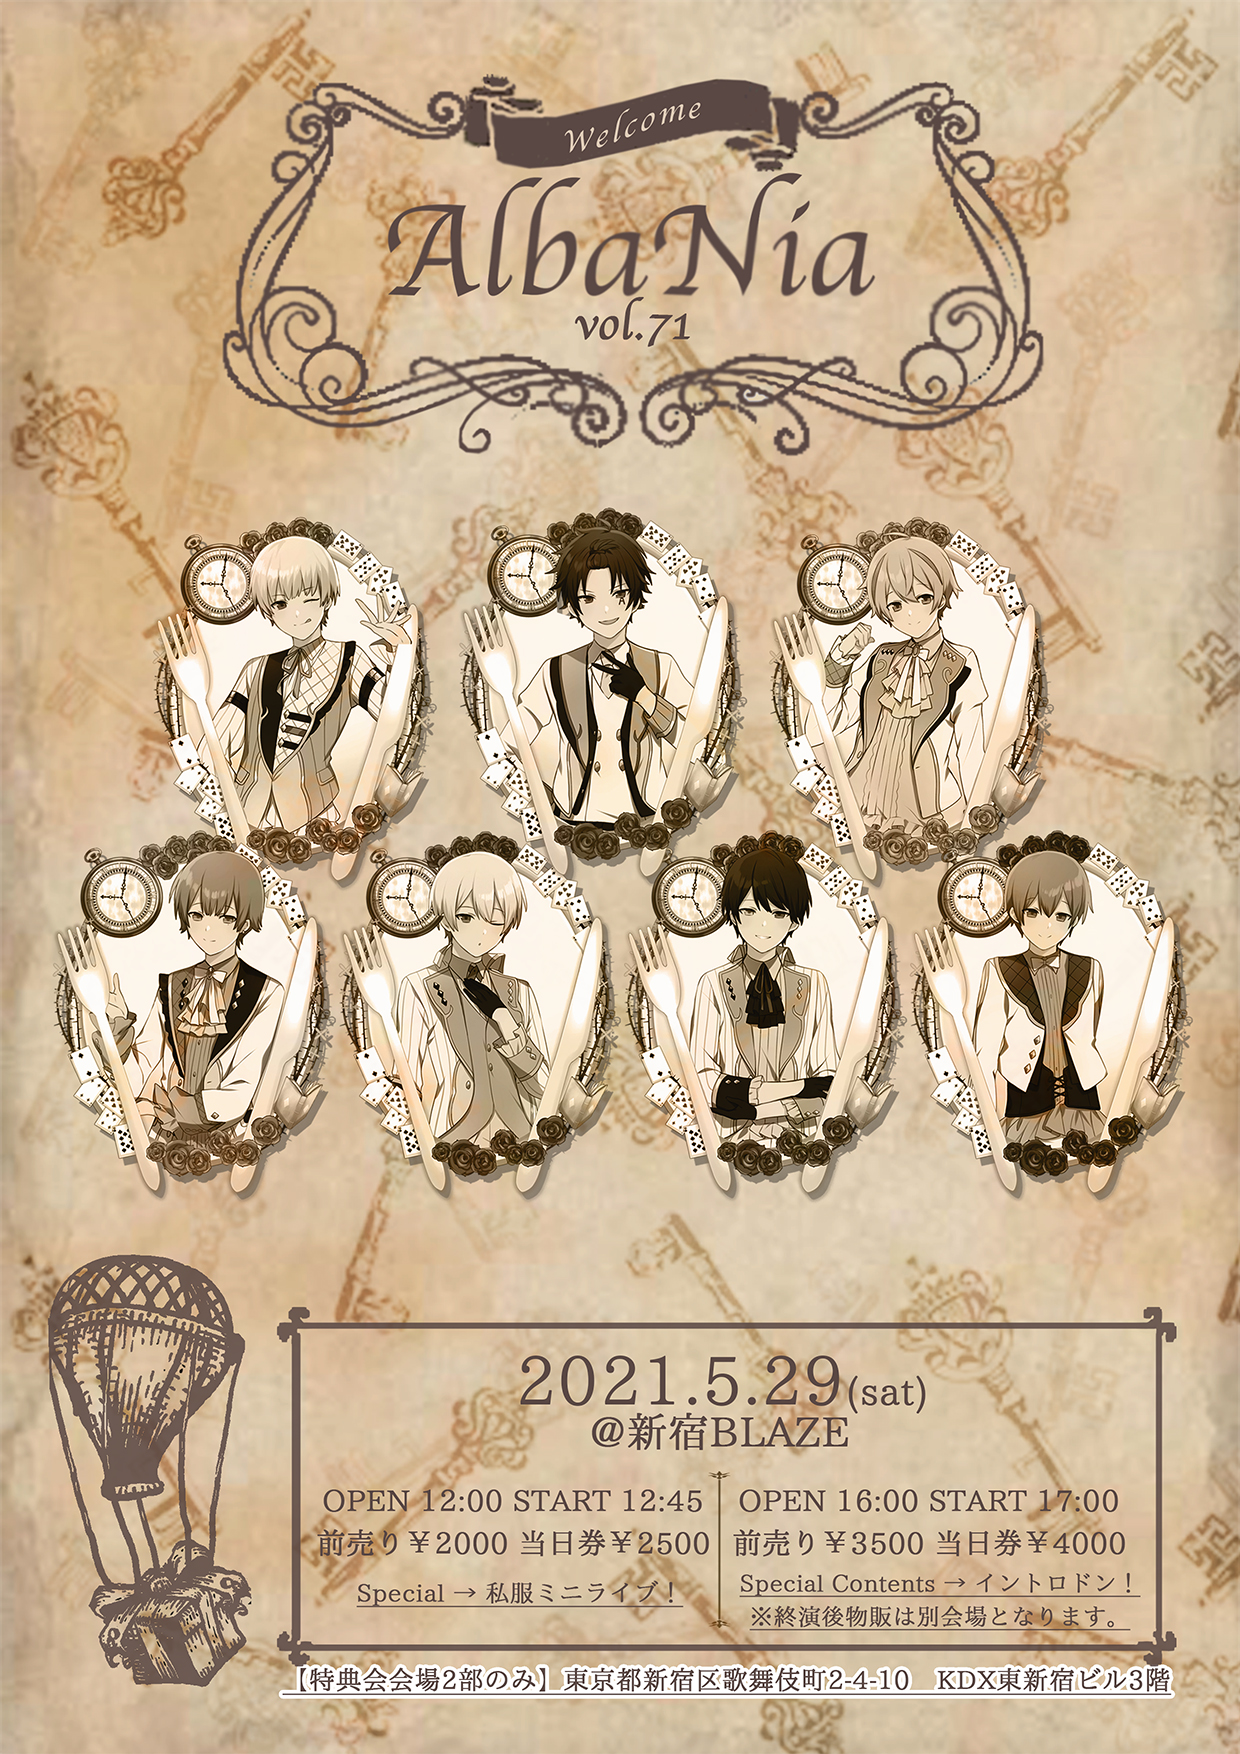 『AlbaNia vol.71(2部)』(AlbaNox定期公演)